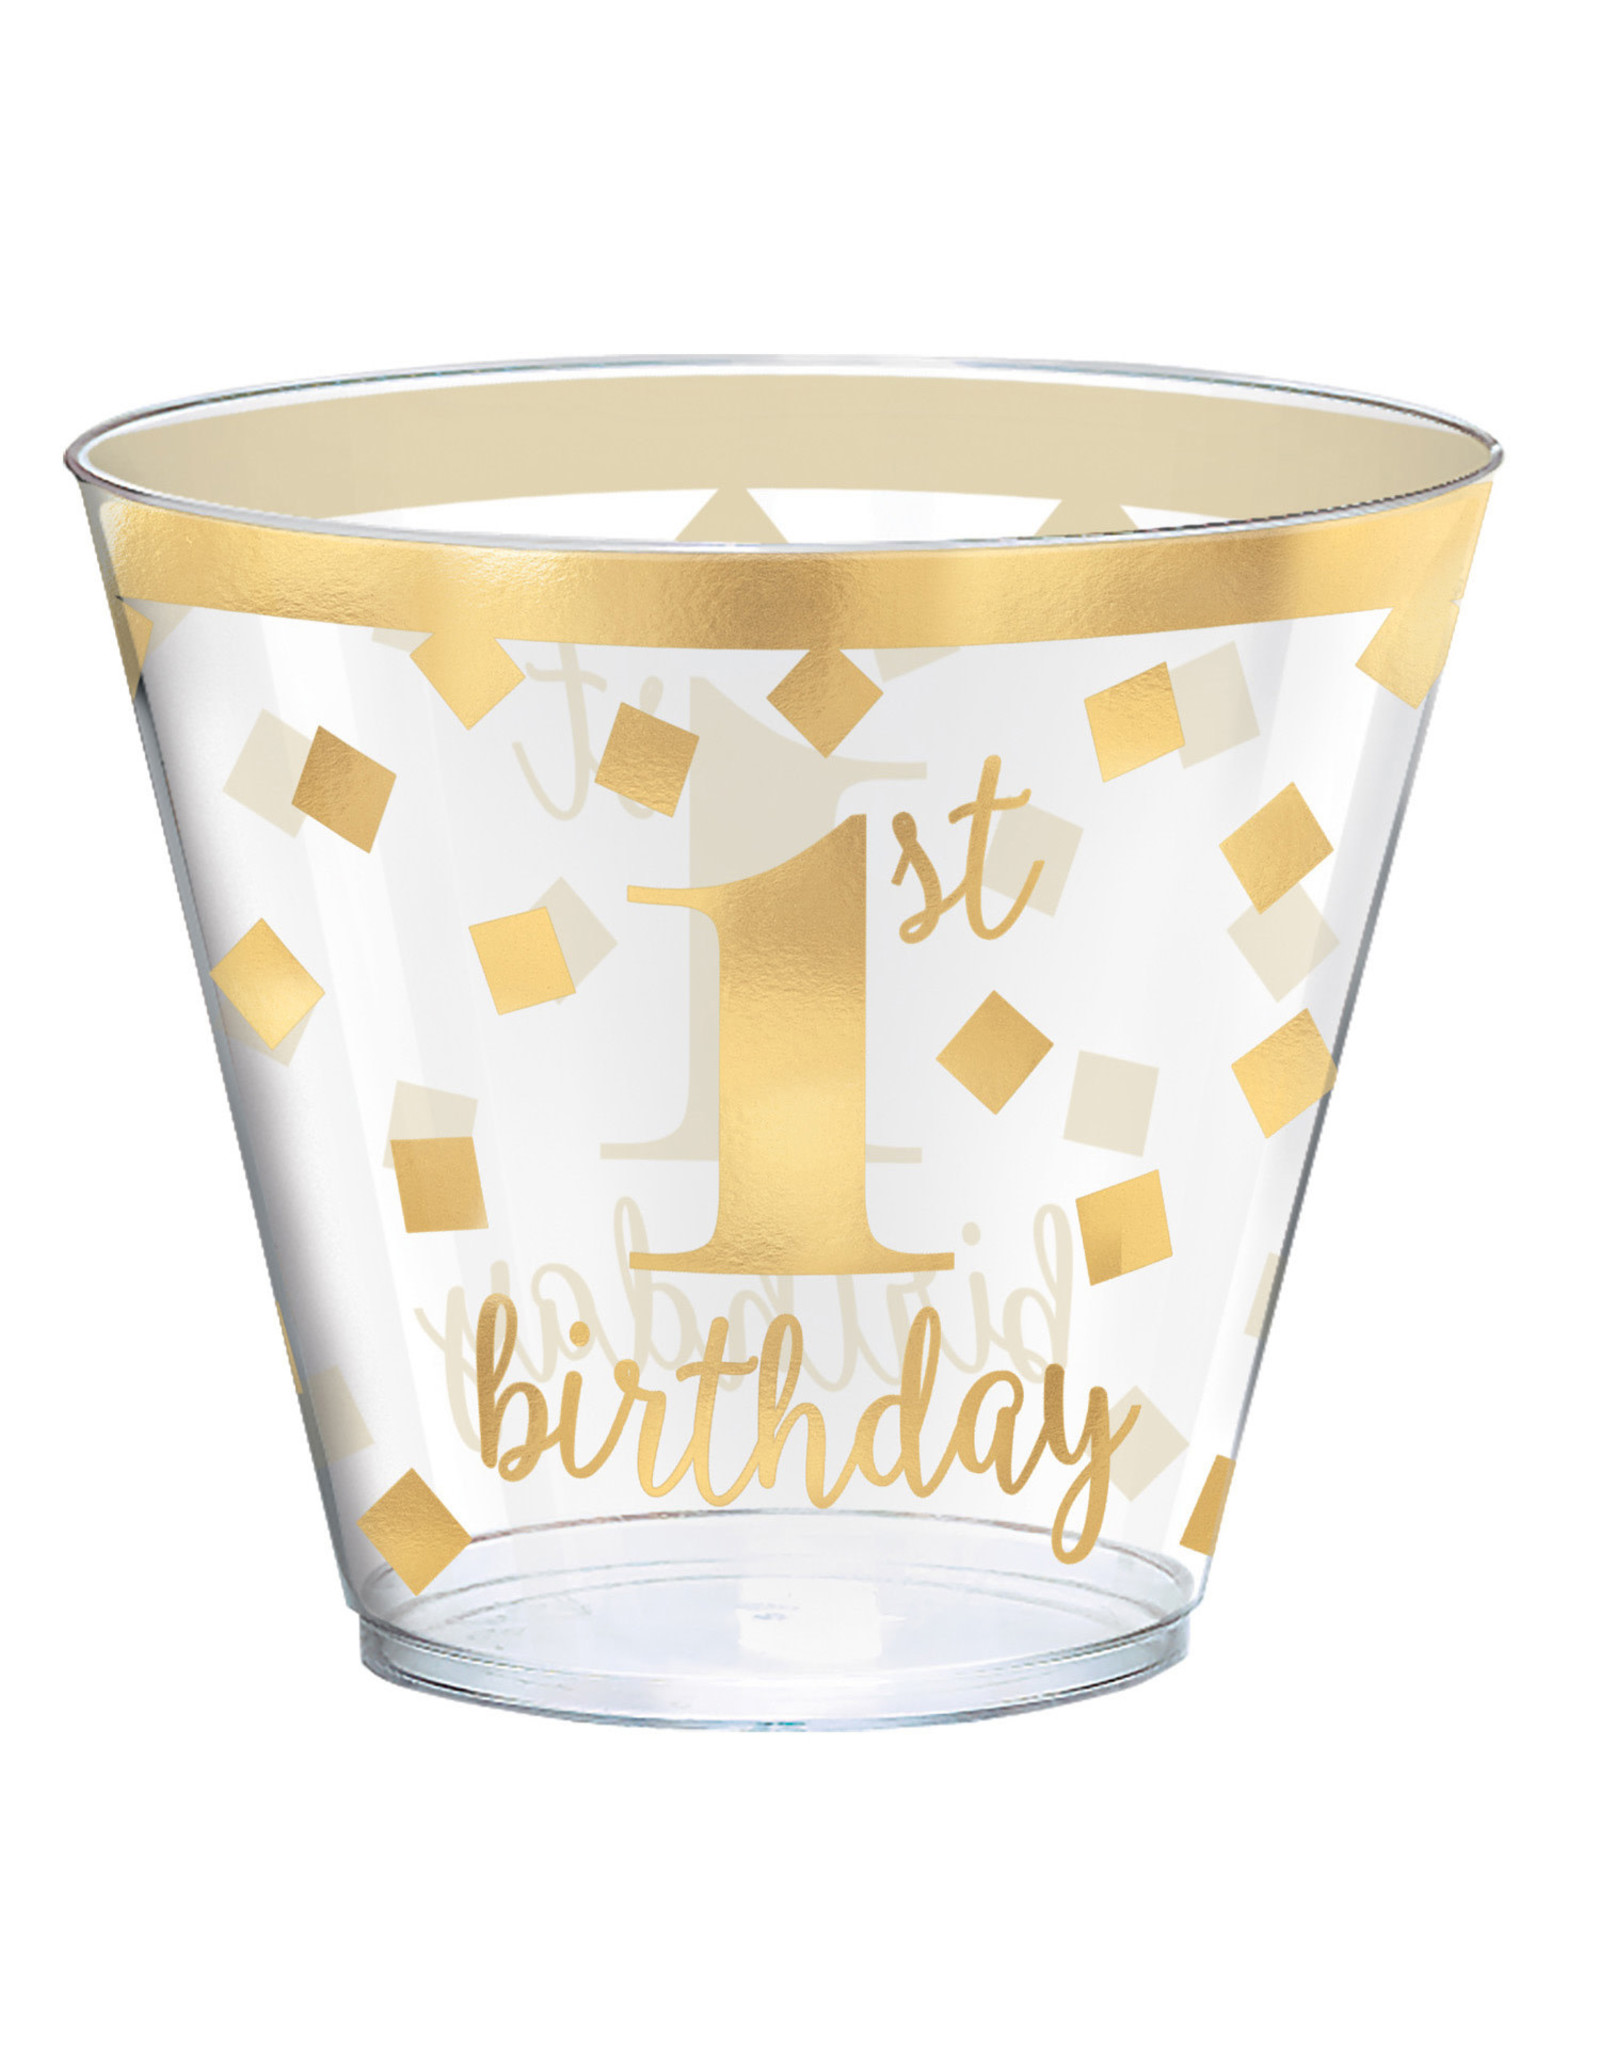 Amscan 1st birthday cups transparant 6 stuks